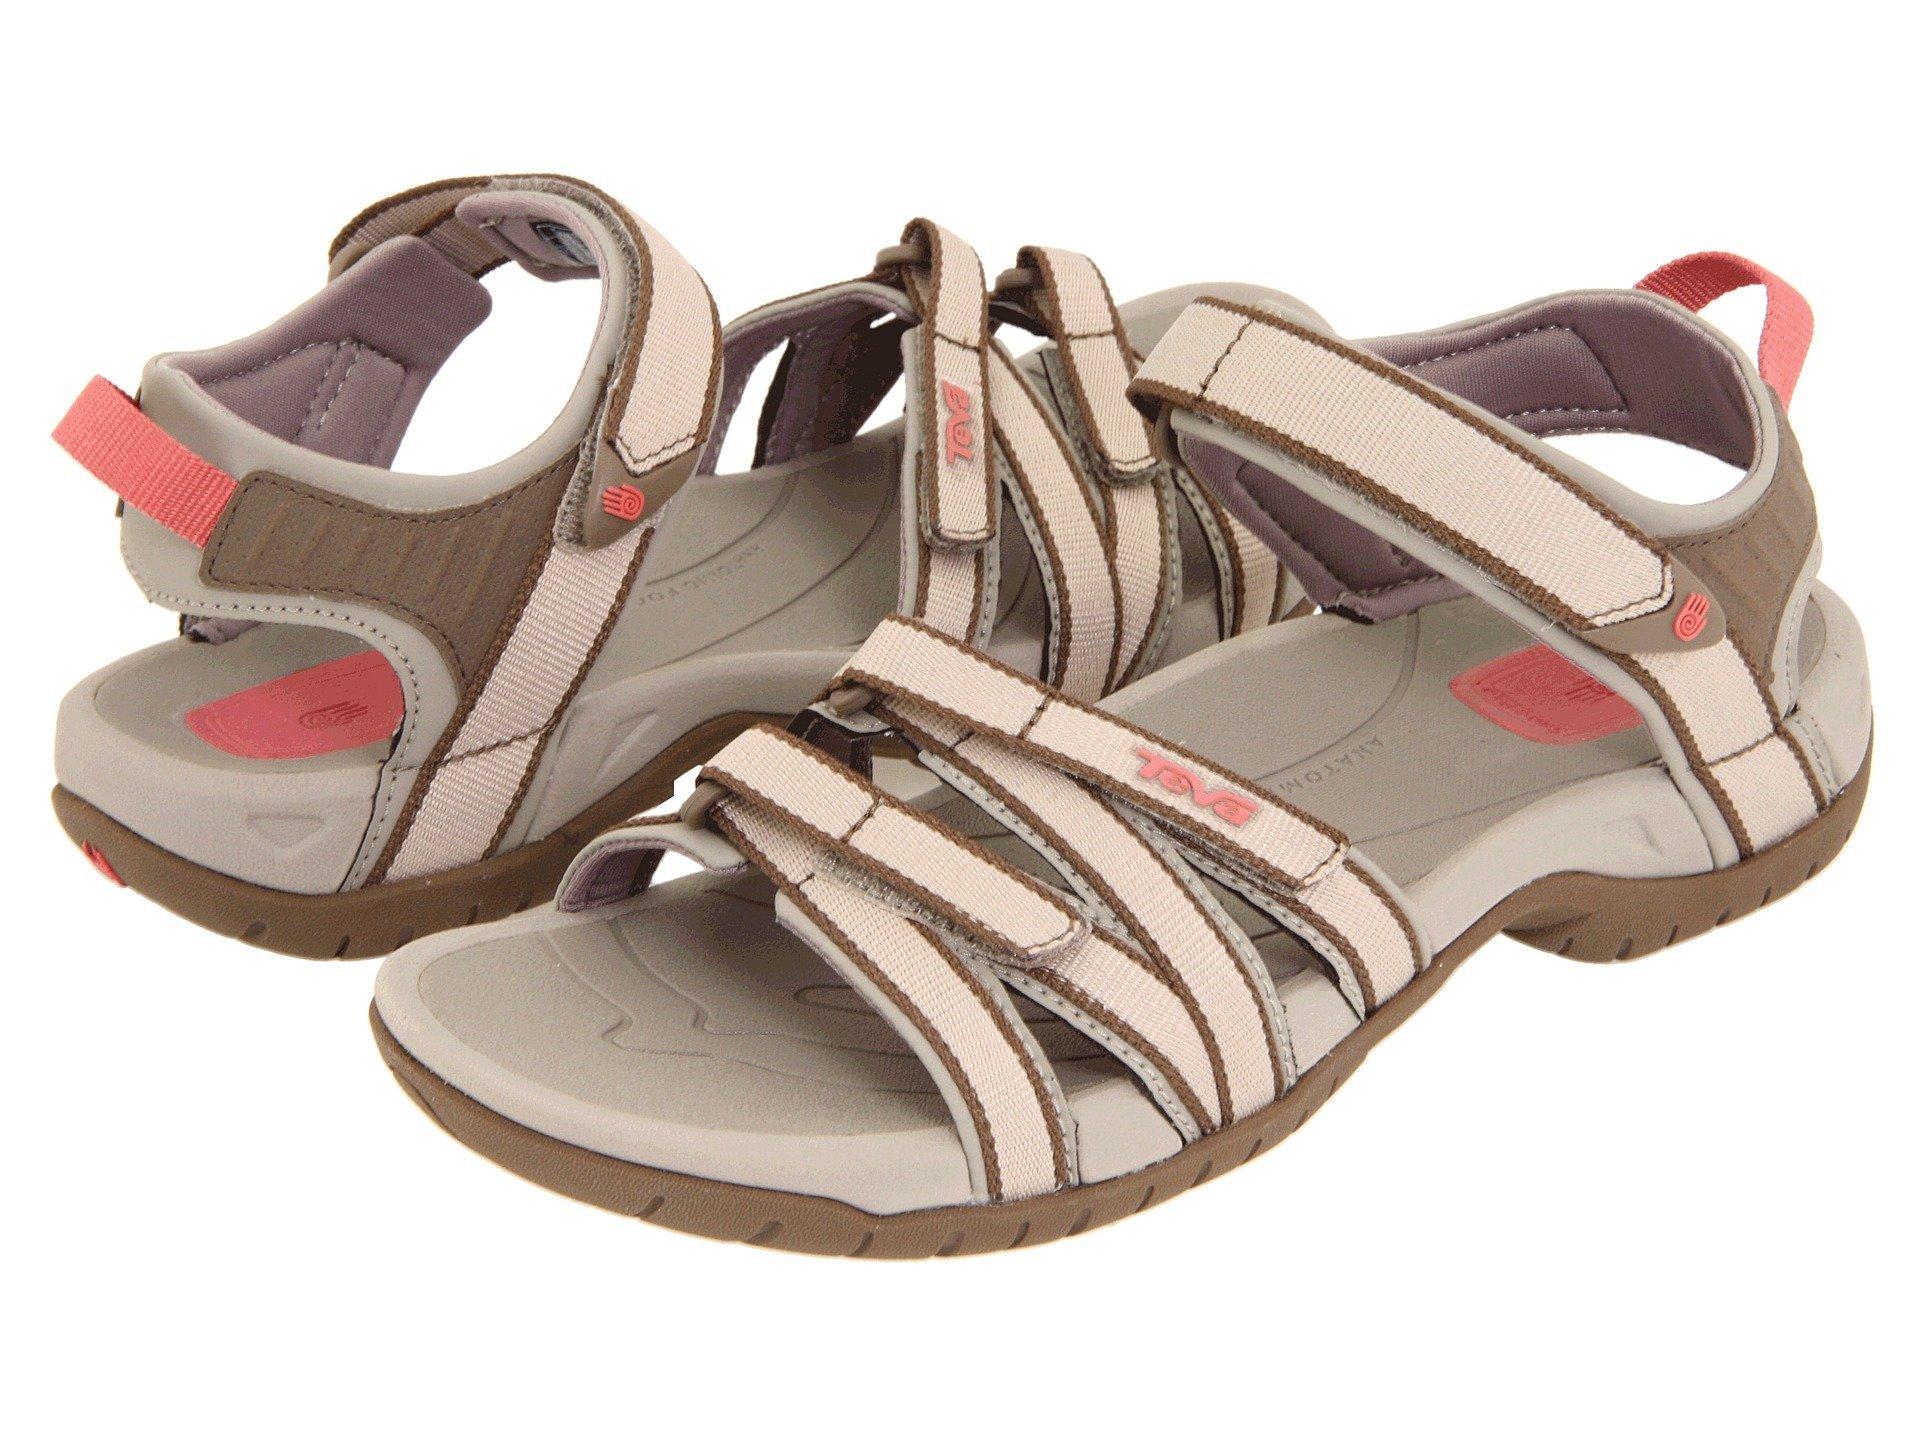 Teva Women's Tirra Sandal,Simply Taupe,8.5 M US